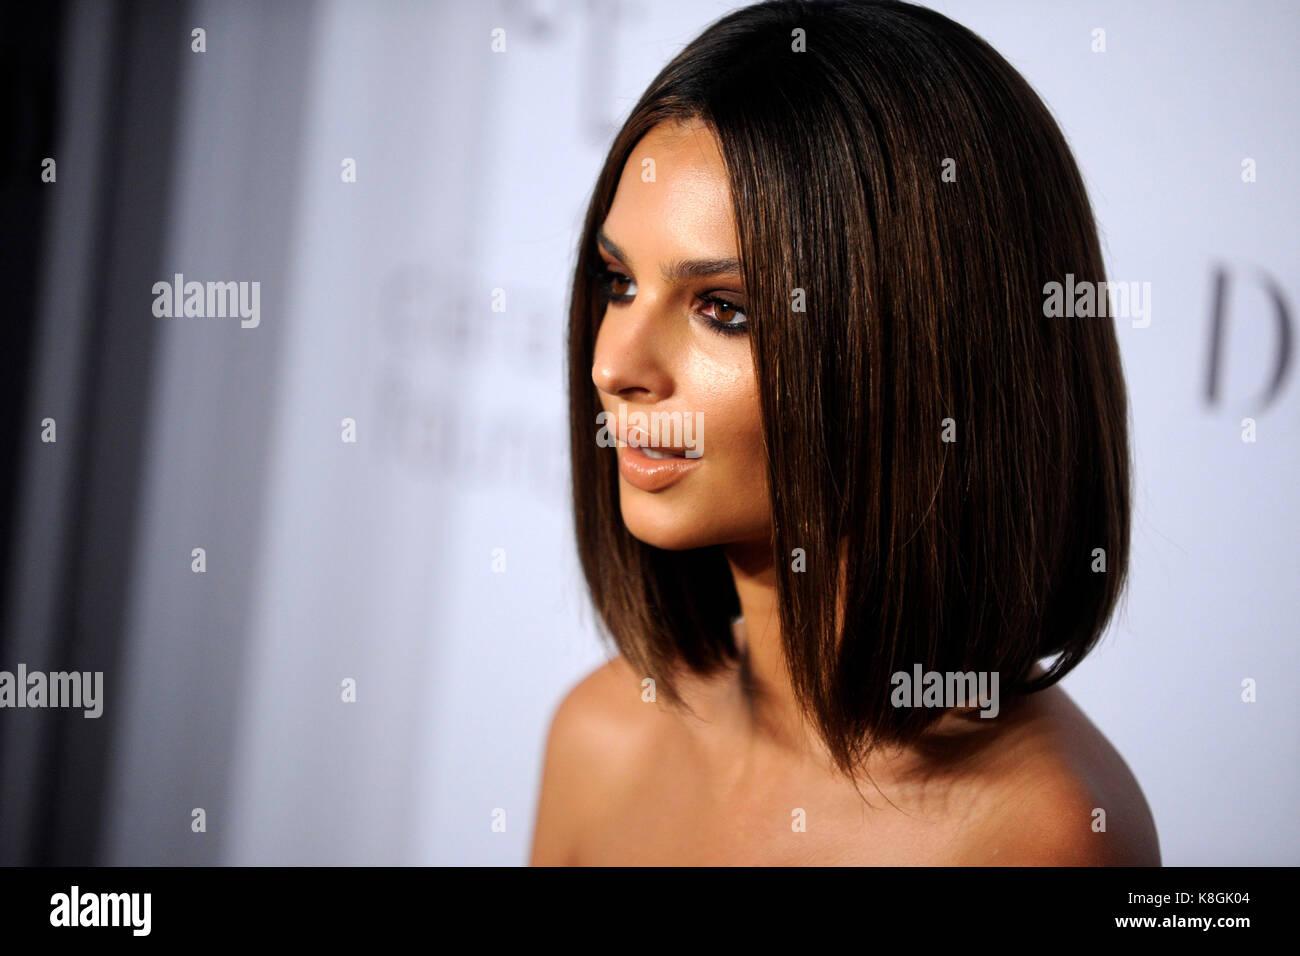 Emily ratajkowski besucht 3. jährlichen Diamond's Rihanna ball Clara lionel Stiftung bei Cipriani wall street profitiert Stockfoto